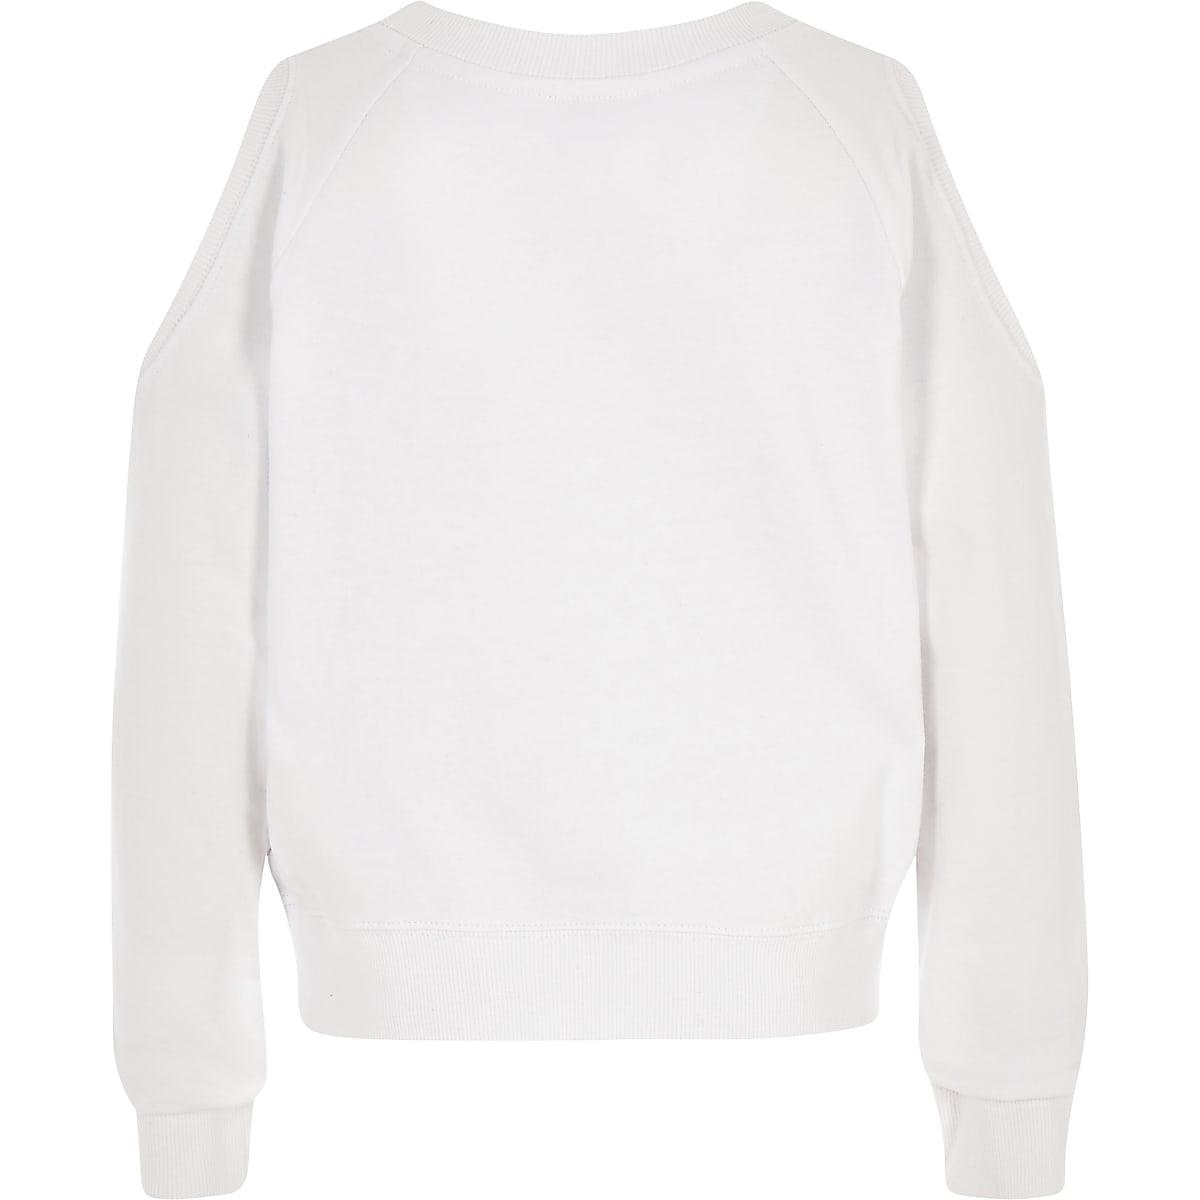 b067fd0daf5a Girls white Converse crop sweatshirt - Hoodies   Sweatshirts - Tops ...